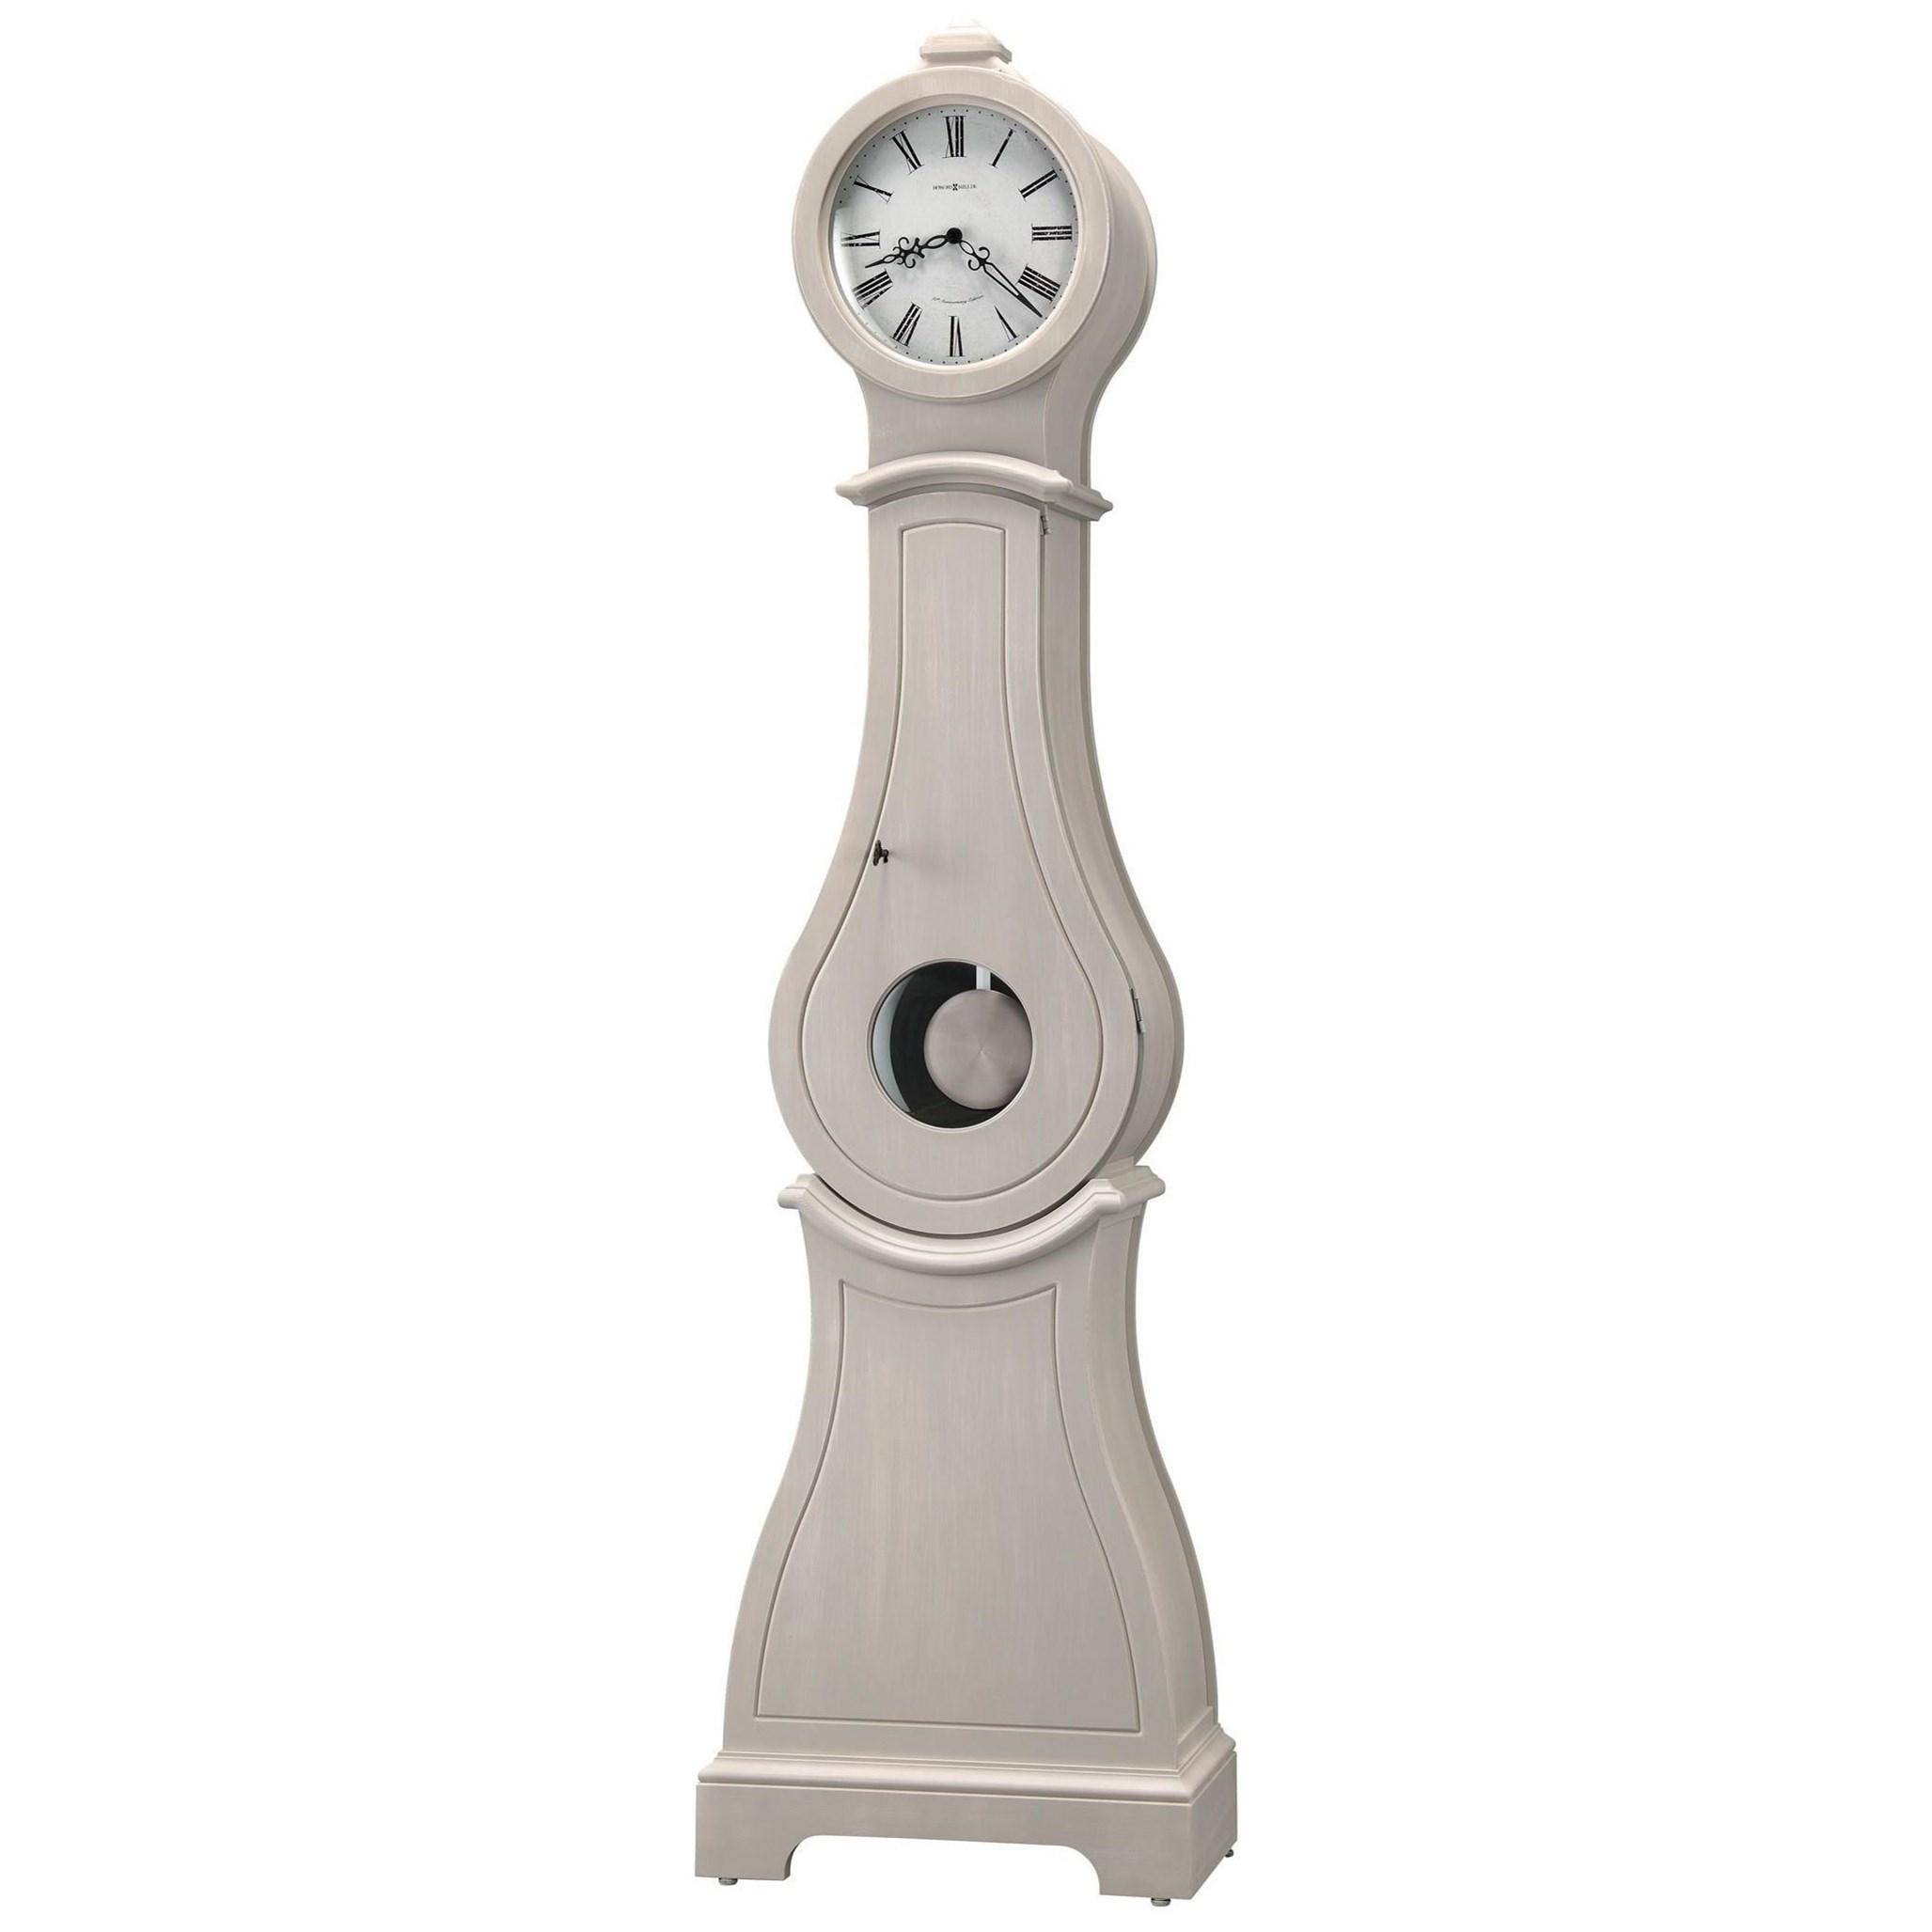 Howard Miller Clocks Torrence Floor Clock - Item Number: 611-268